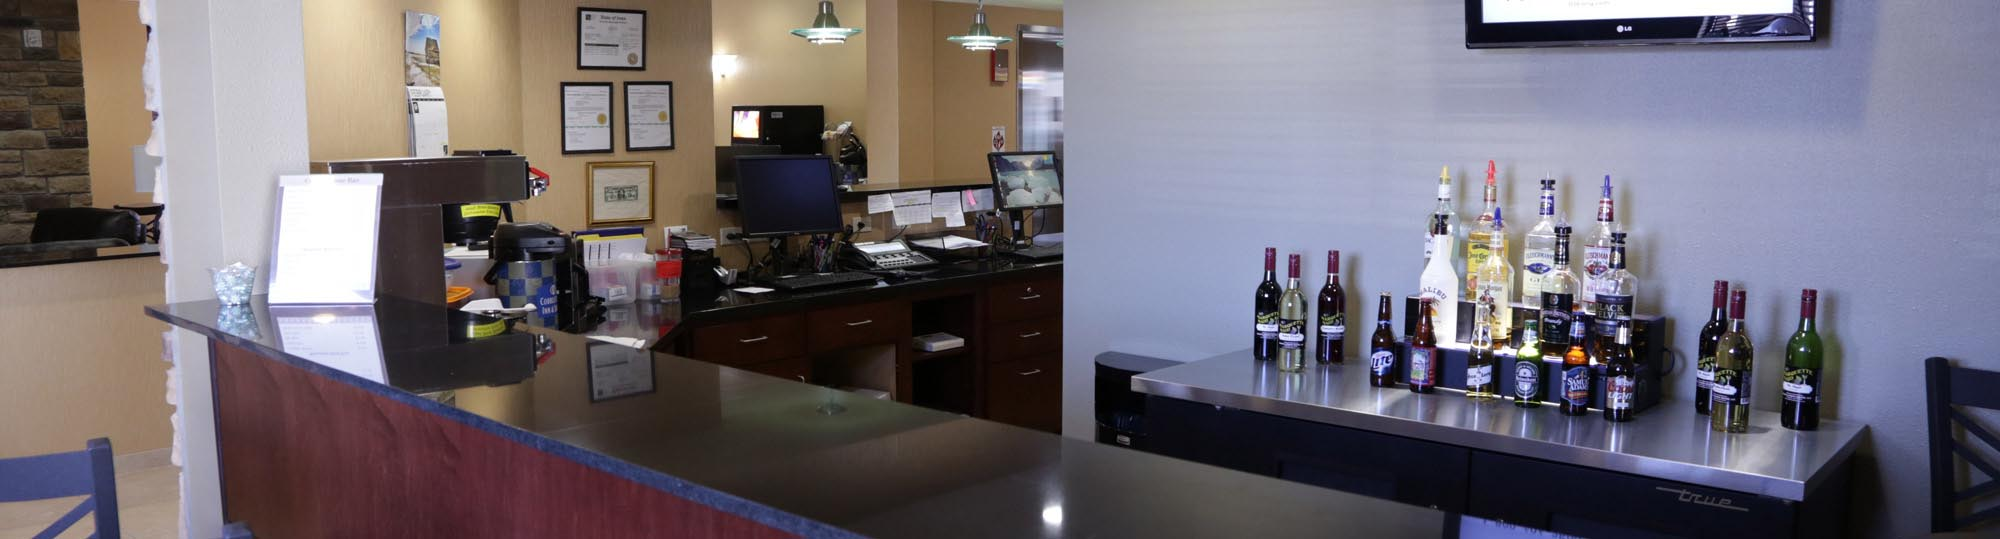 Cobblestone Inn and Suites Marquette